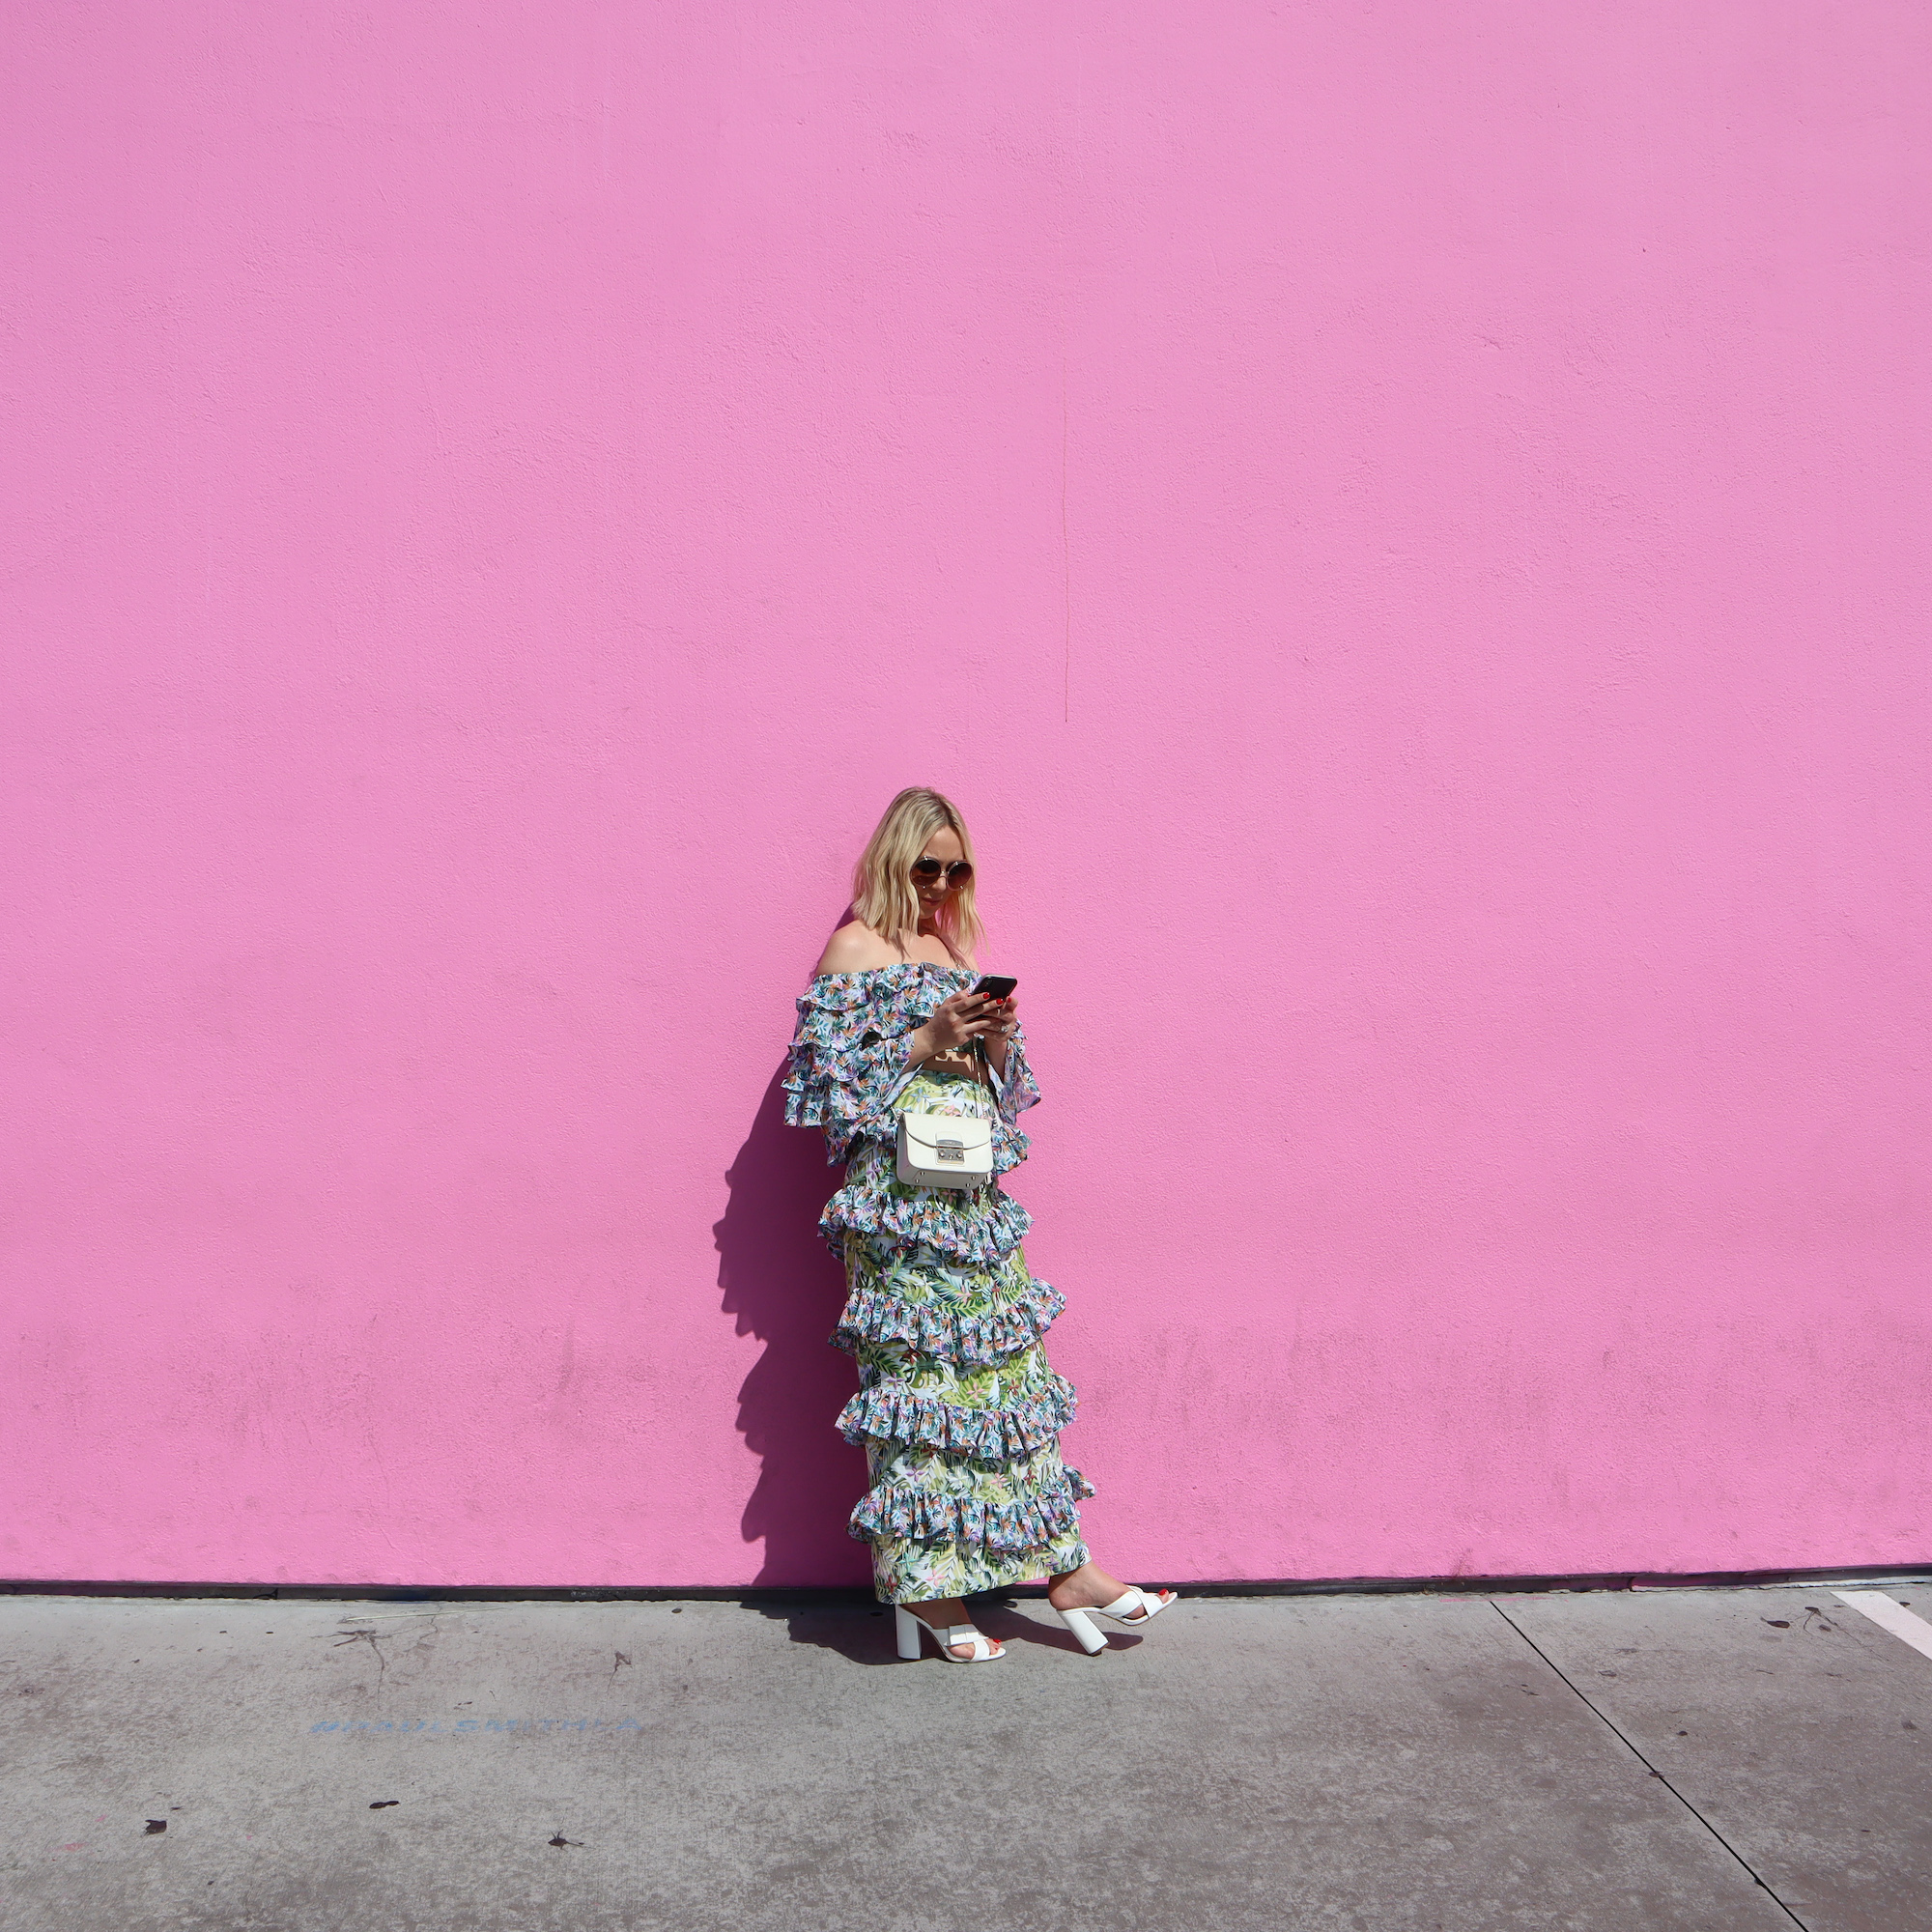 the-pink-wall-la.jpg